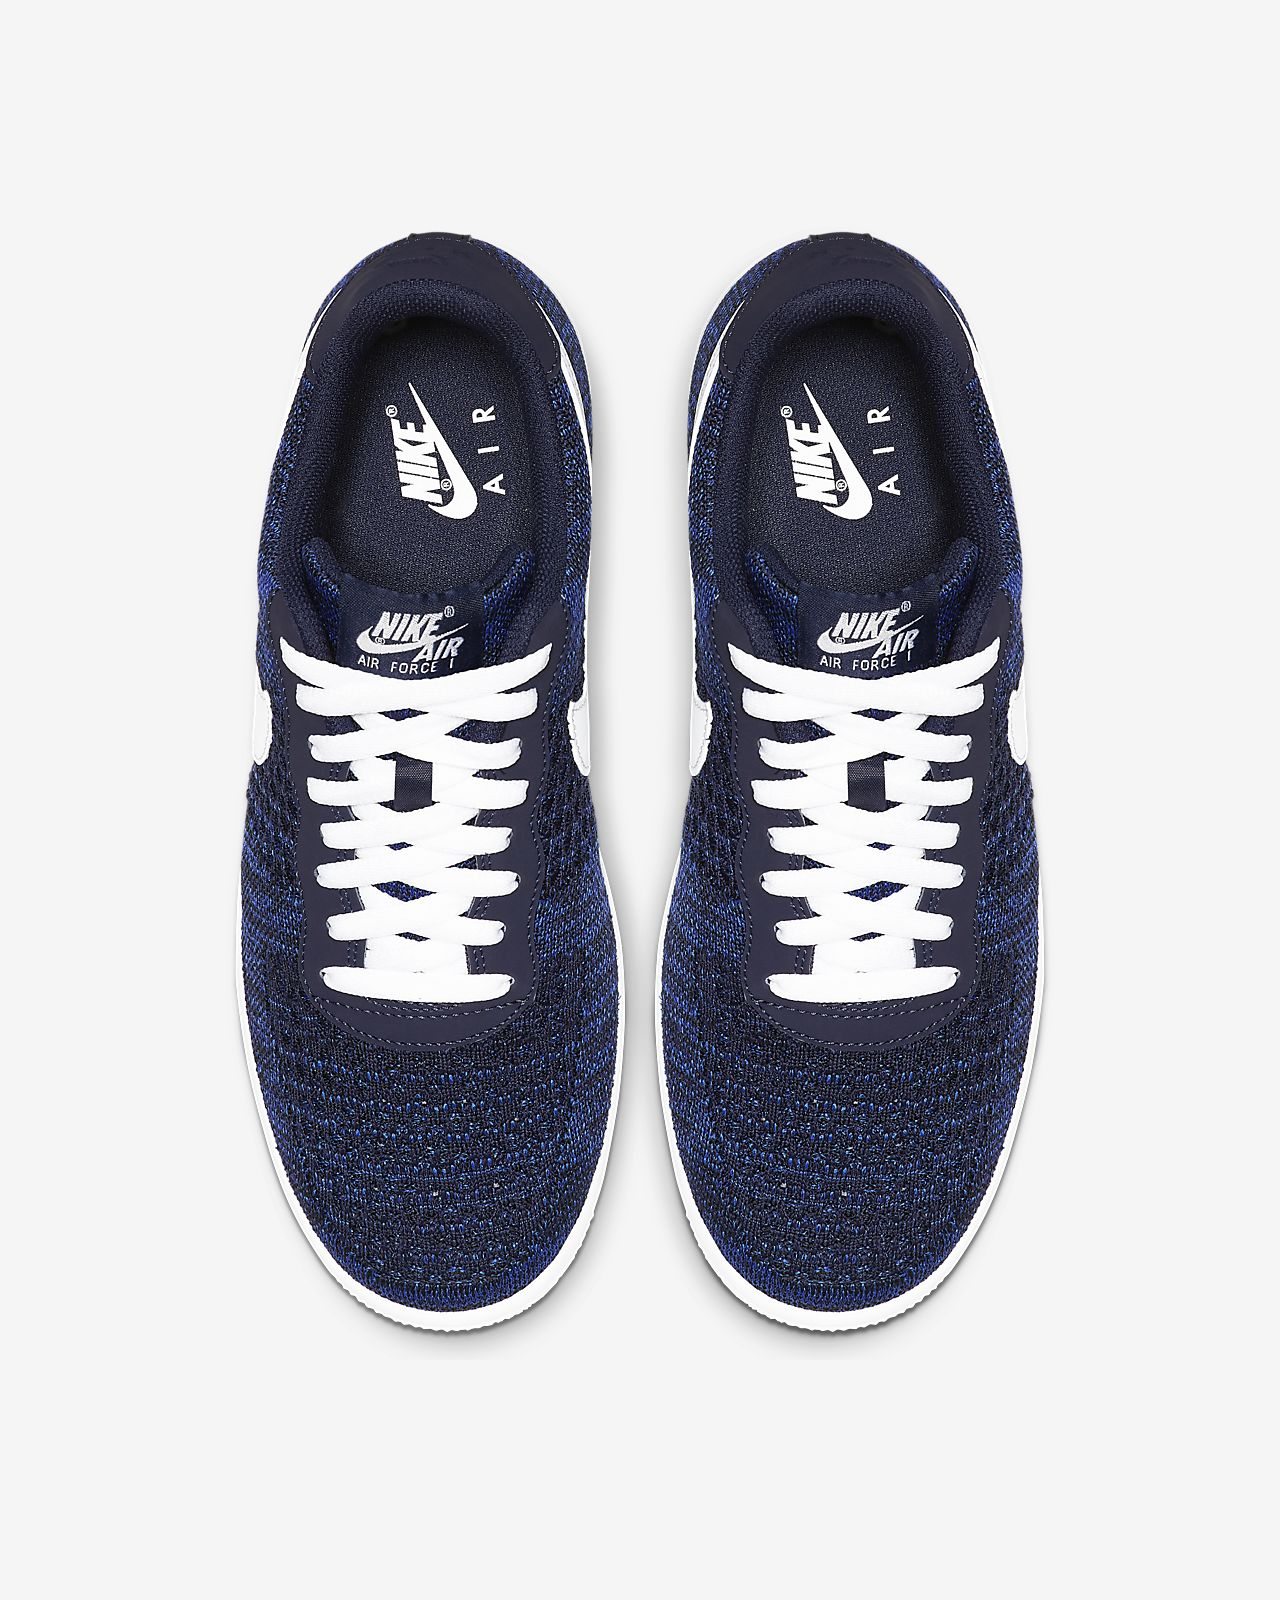 1cad832ea1c6a Nike Air Force 1 Flyknit 2.0 Shoe. Nike.com LU